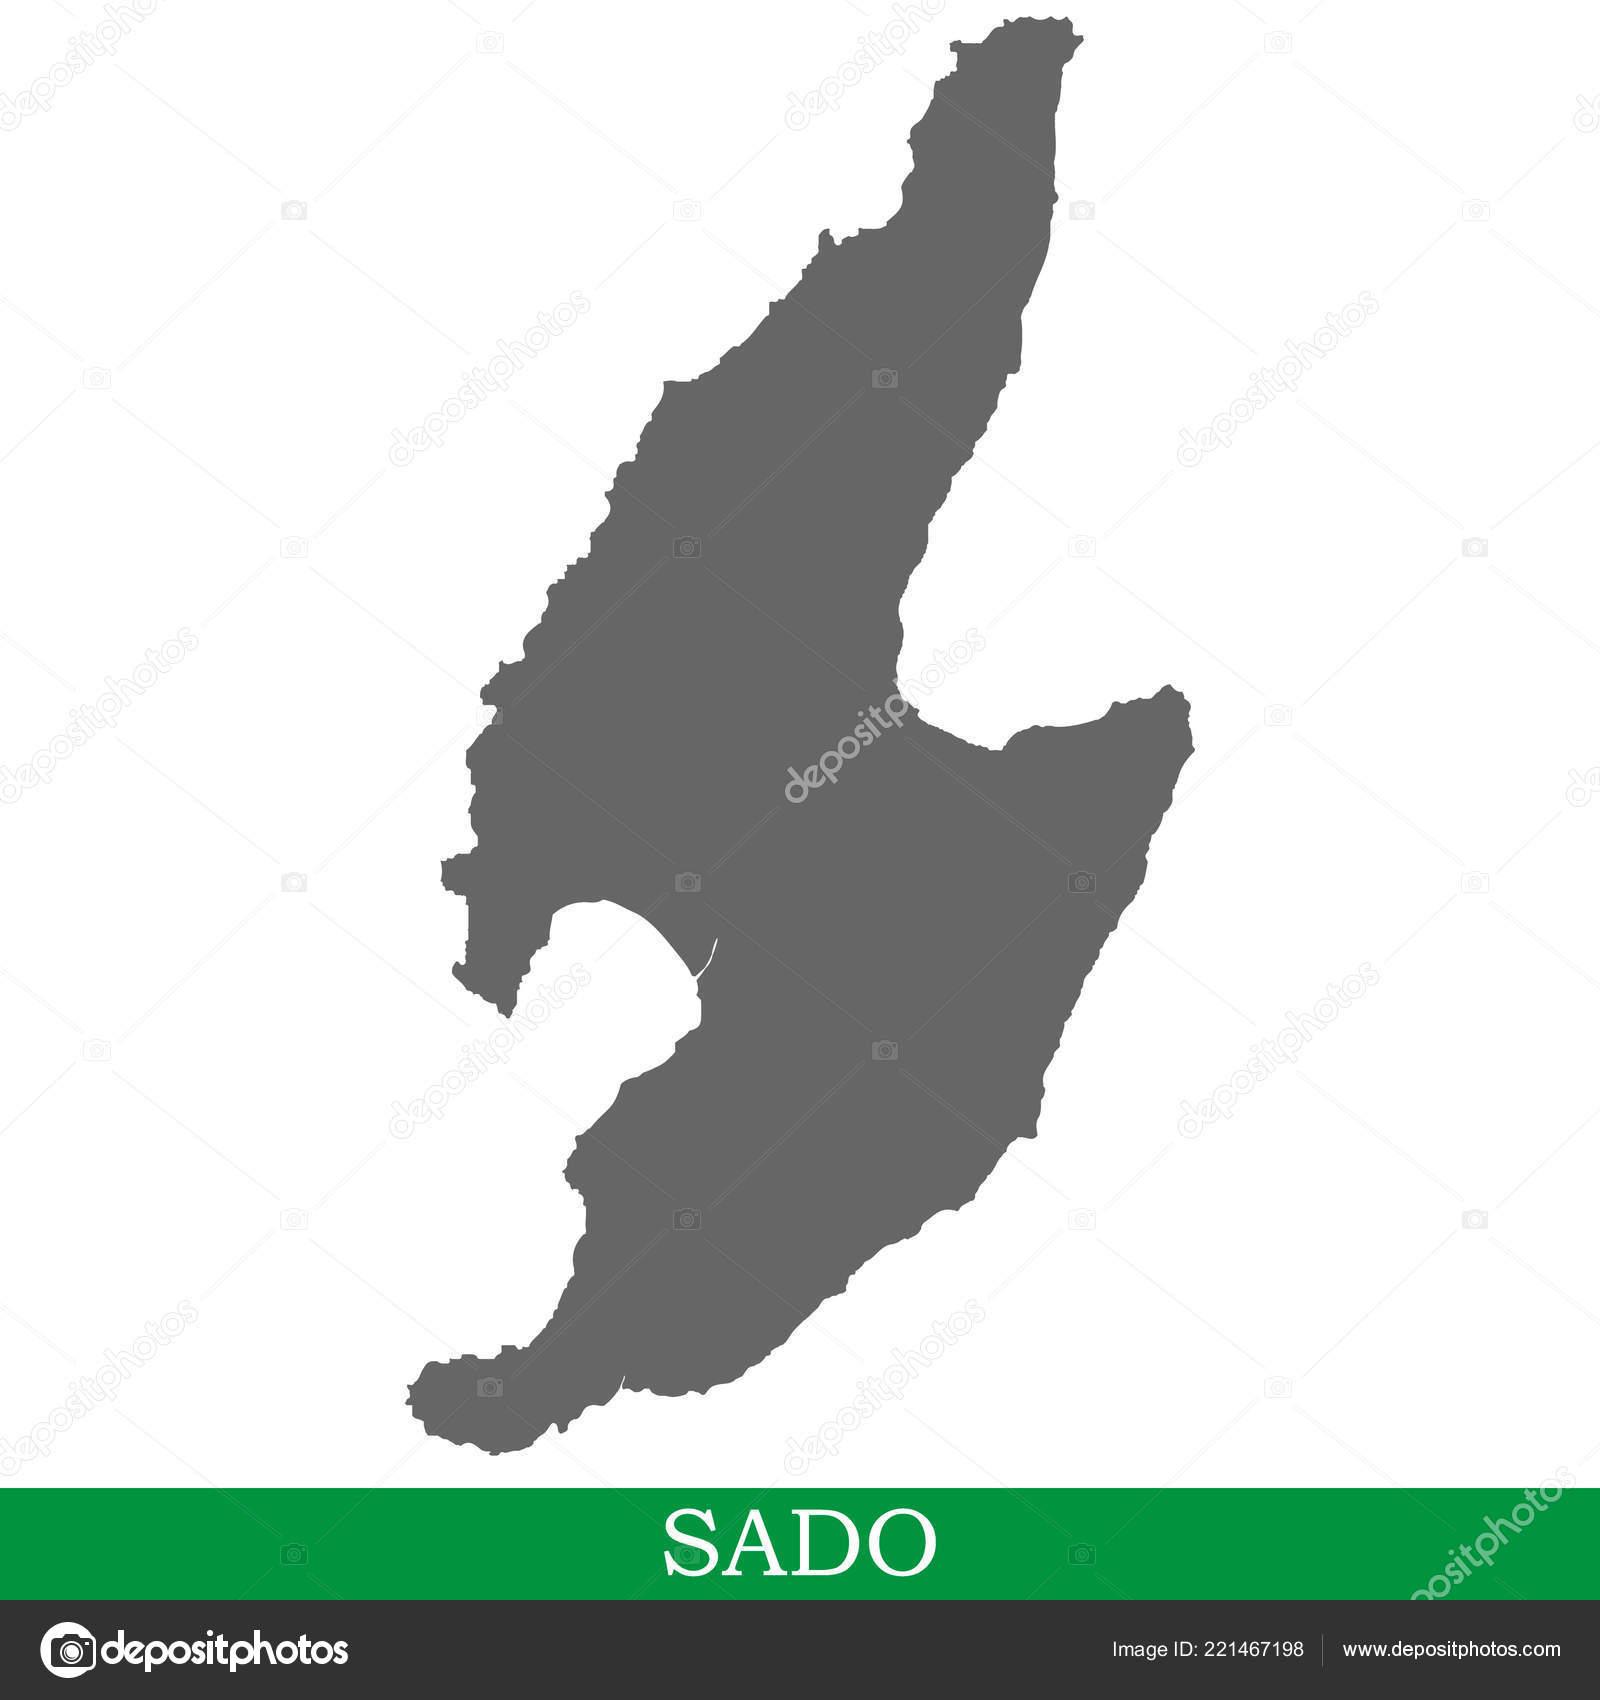 chat sado espanol